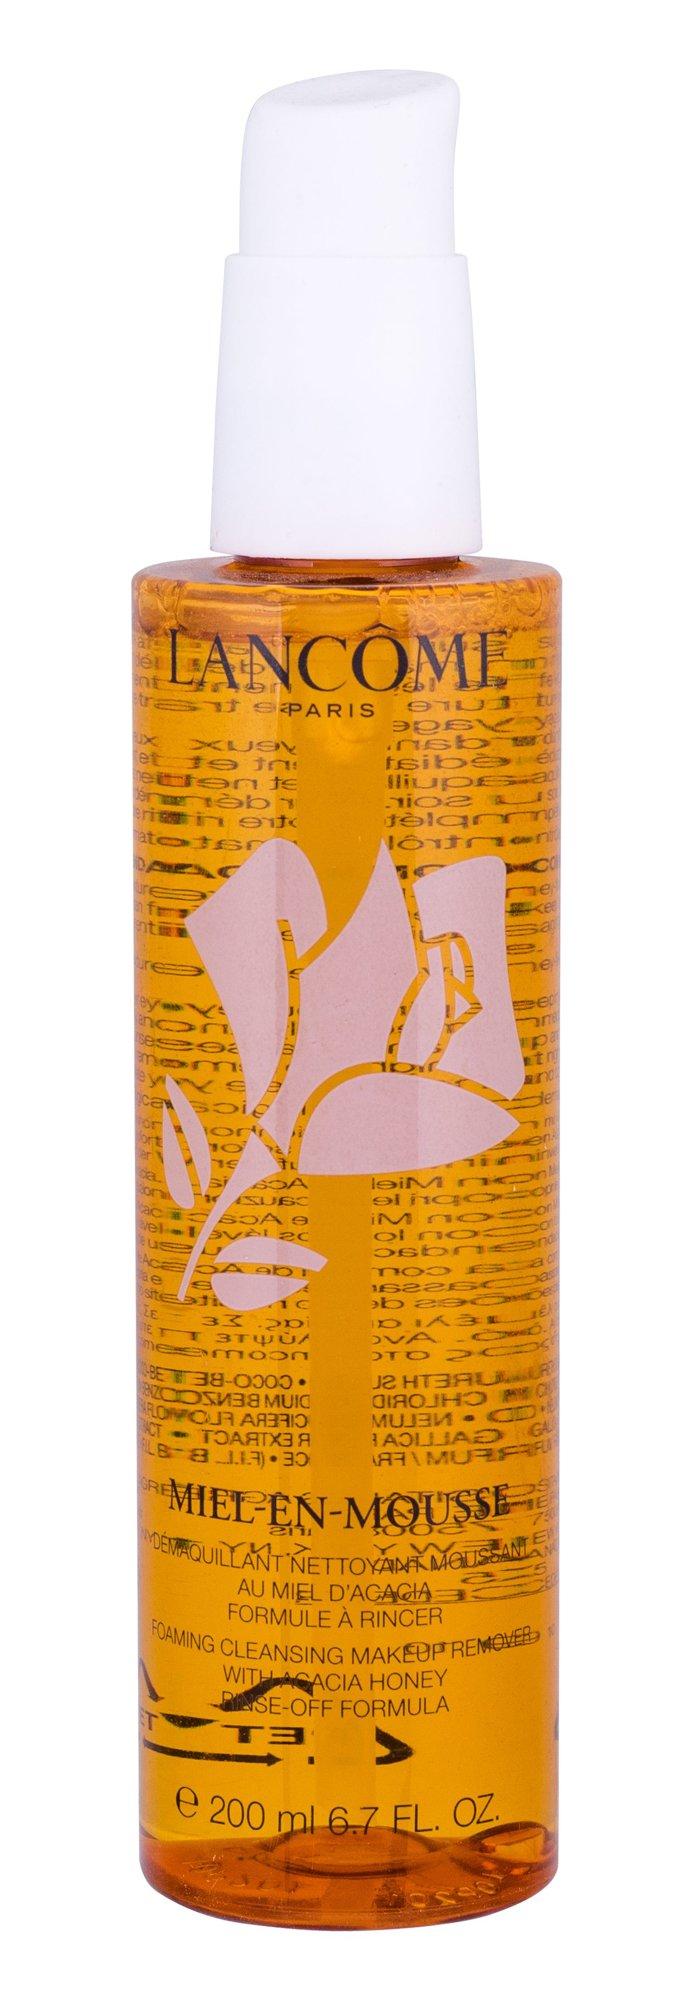 Lancôme Miel-en-Mousse Cosmetic 200ml